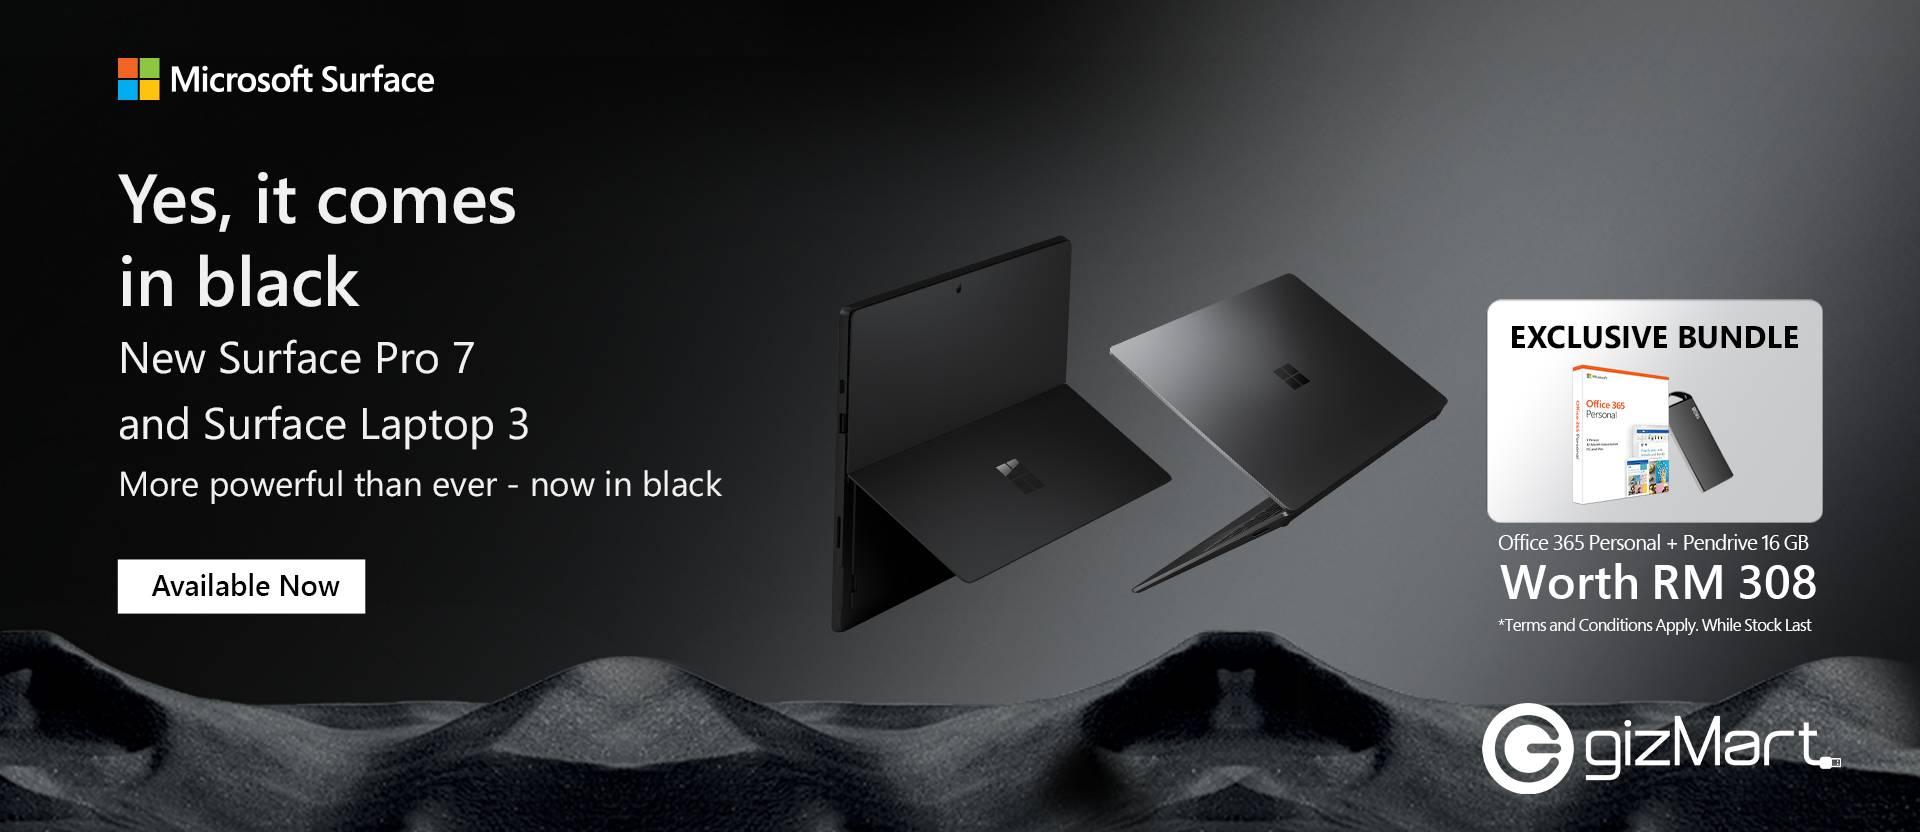 Surface Pro 7 & Surface Laptop 3